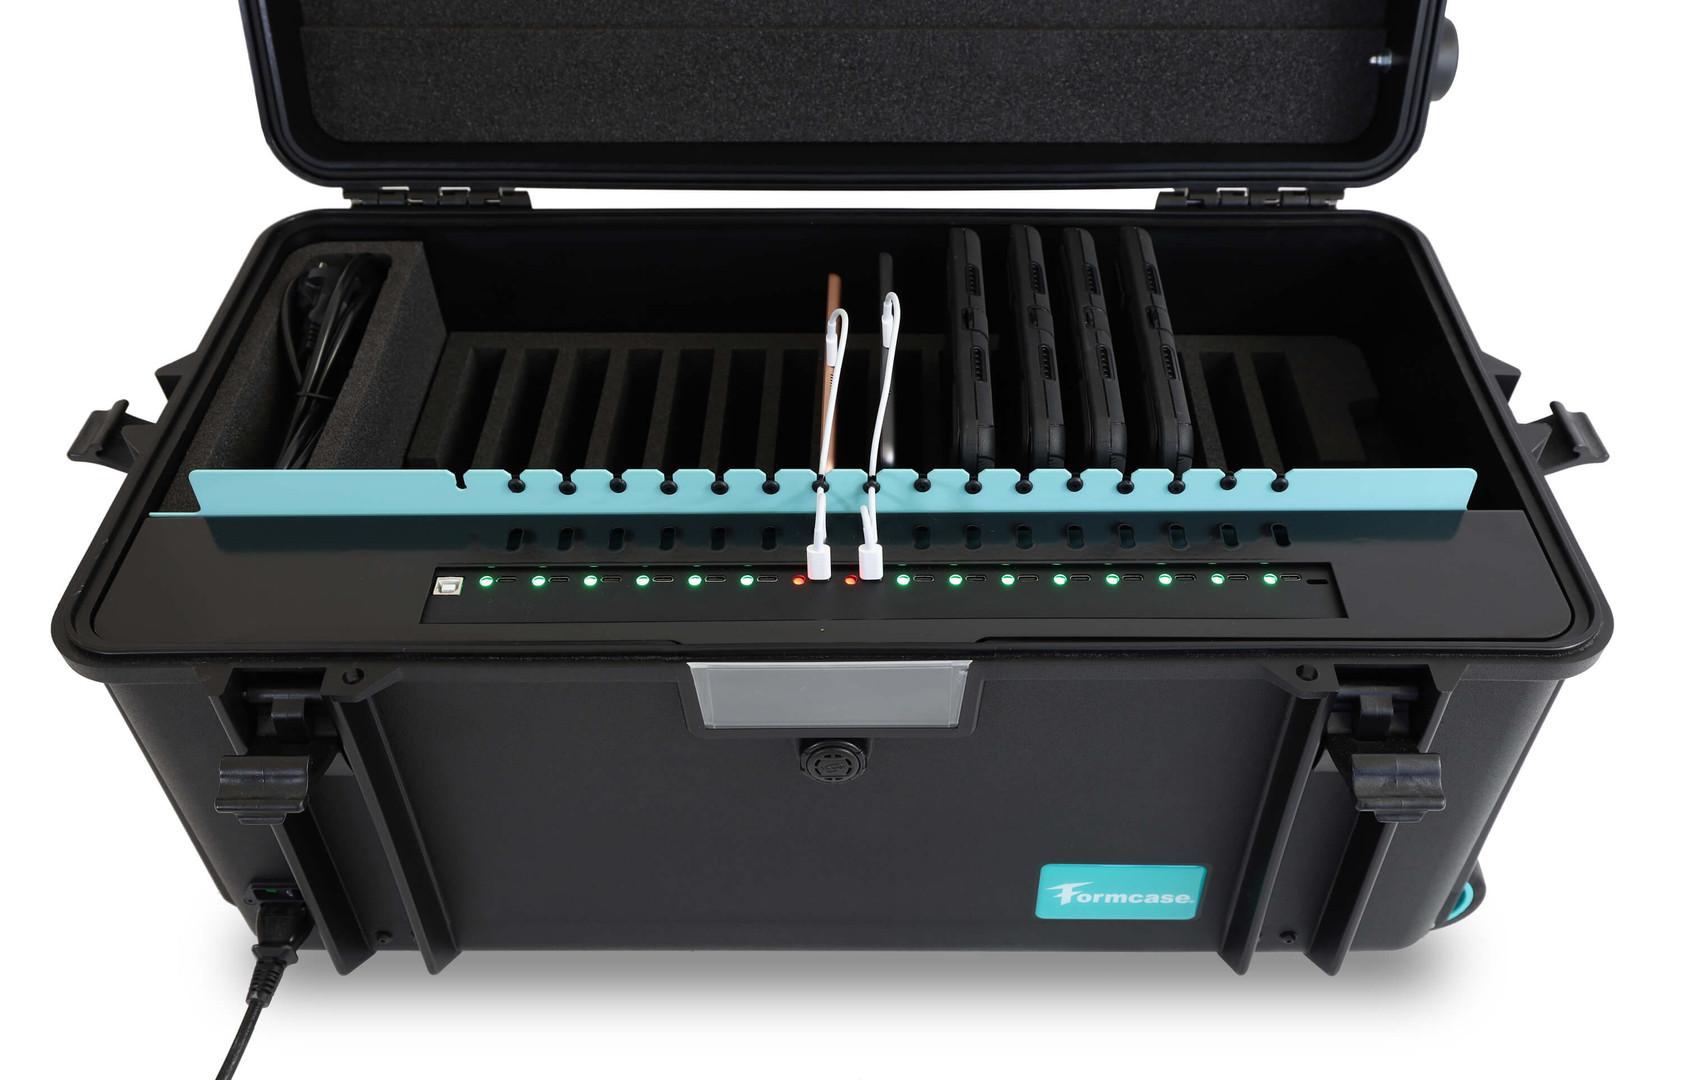 ipadkoffer_TransformerCase-T16Pro-USBC-1